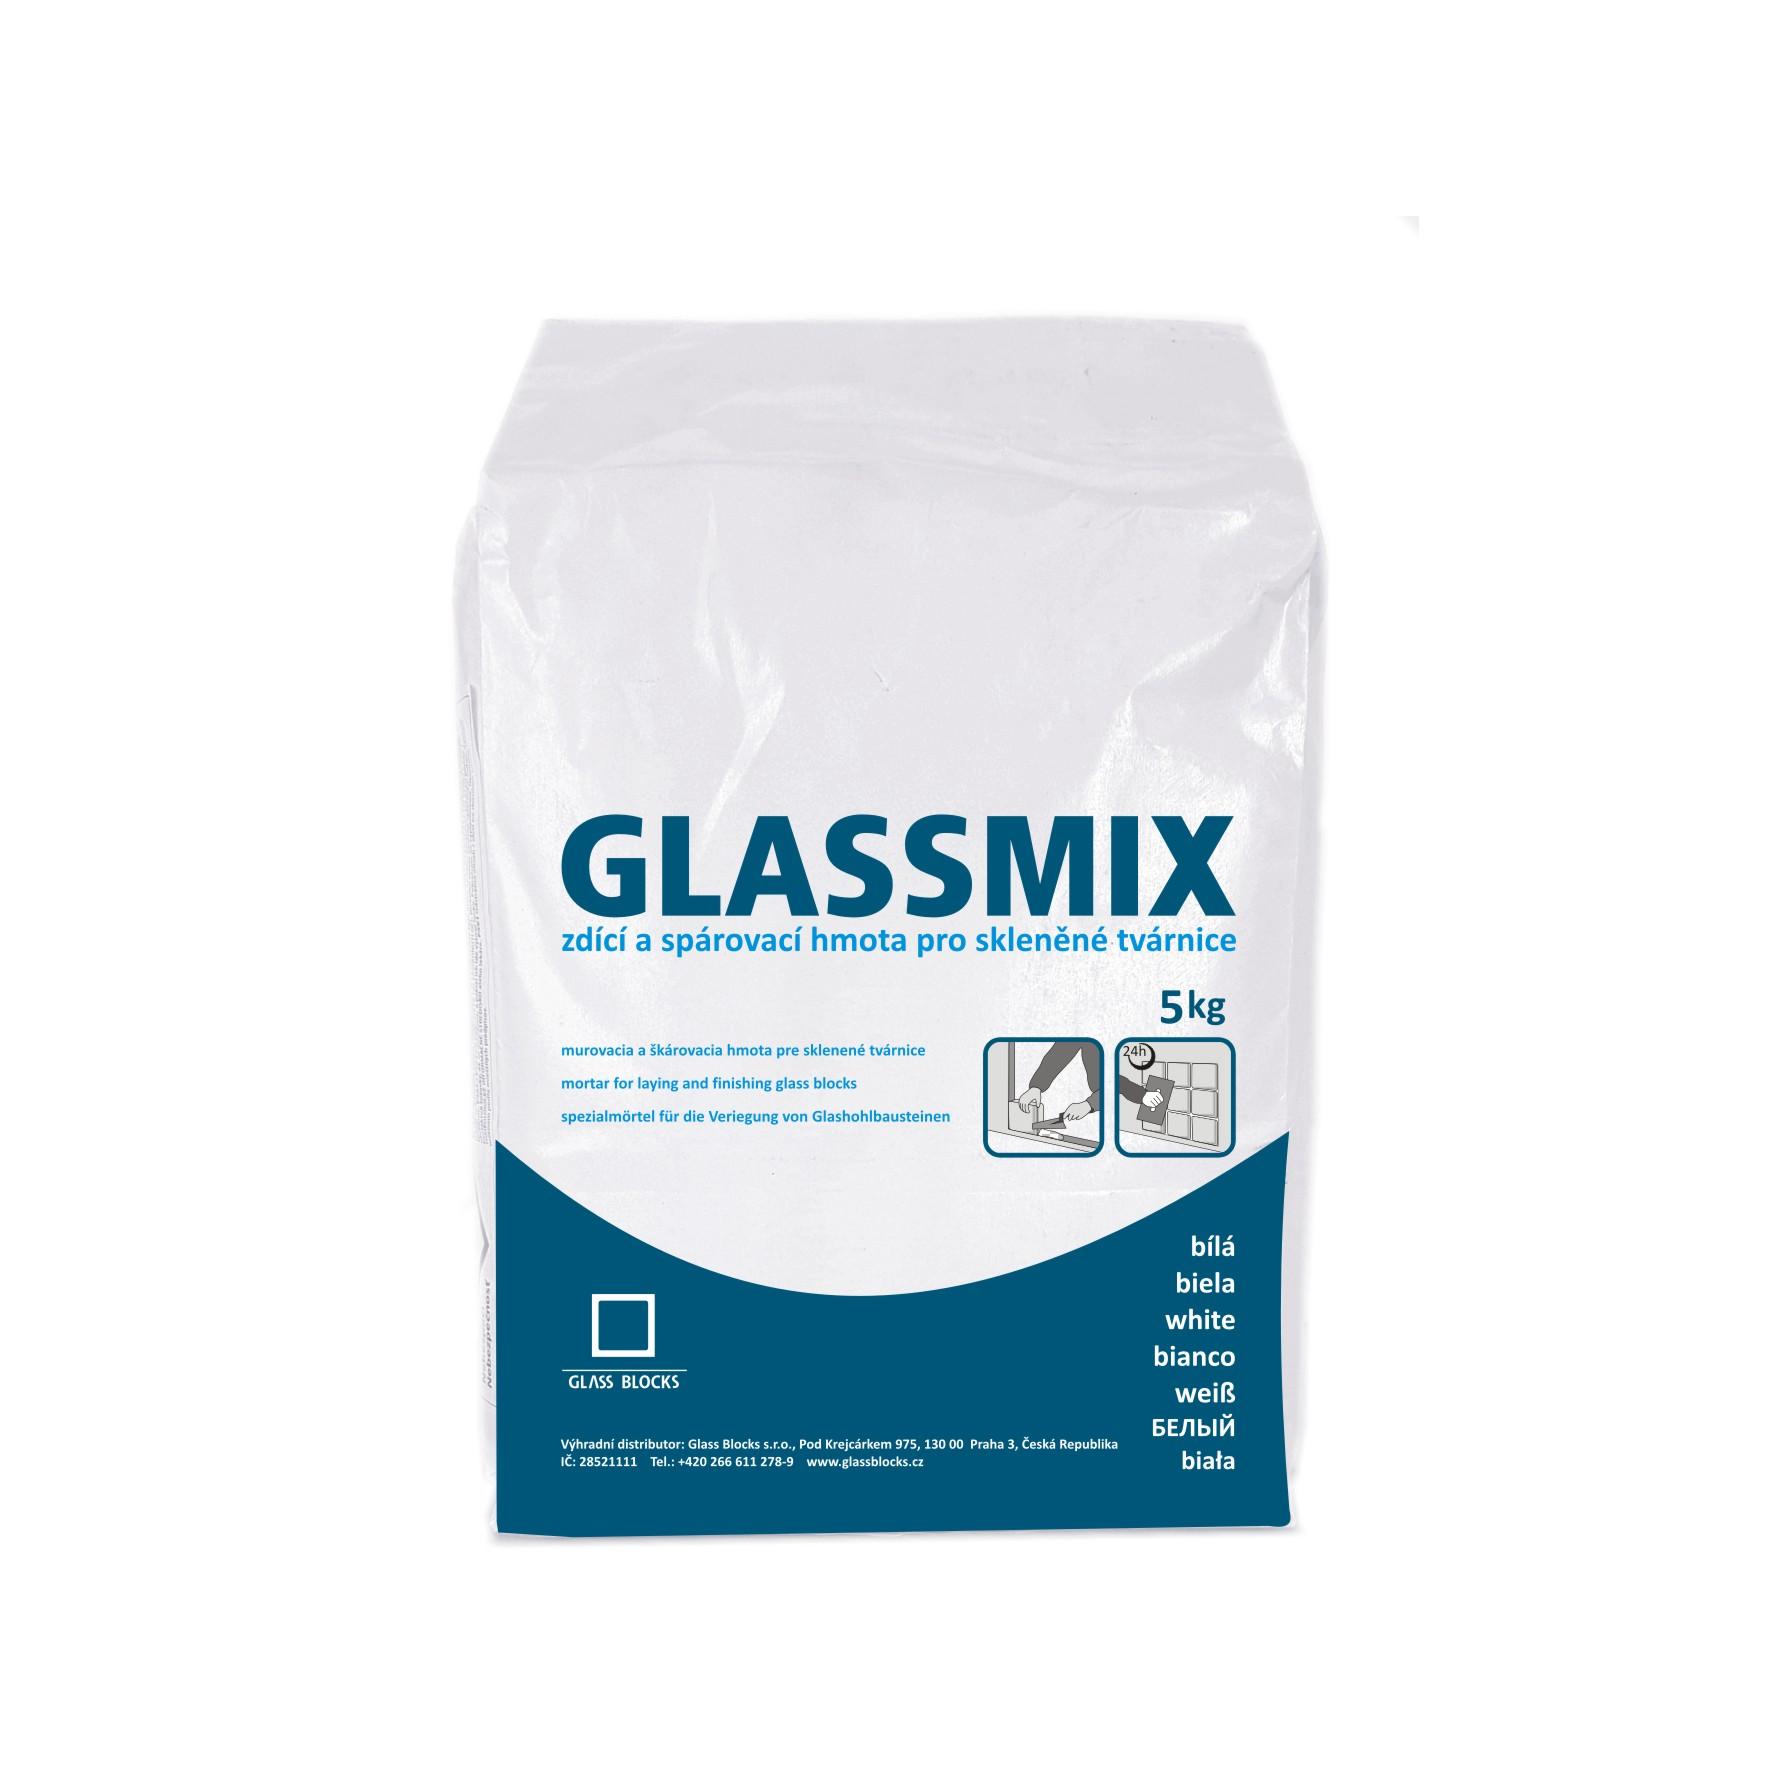 GlassMix5kg.jpg